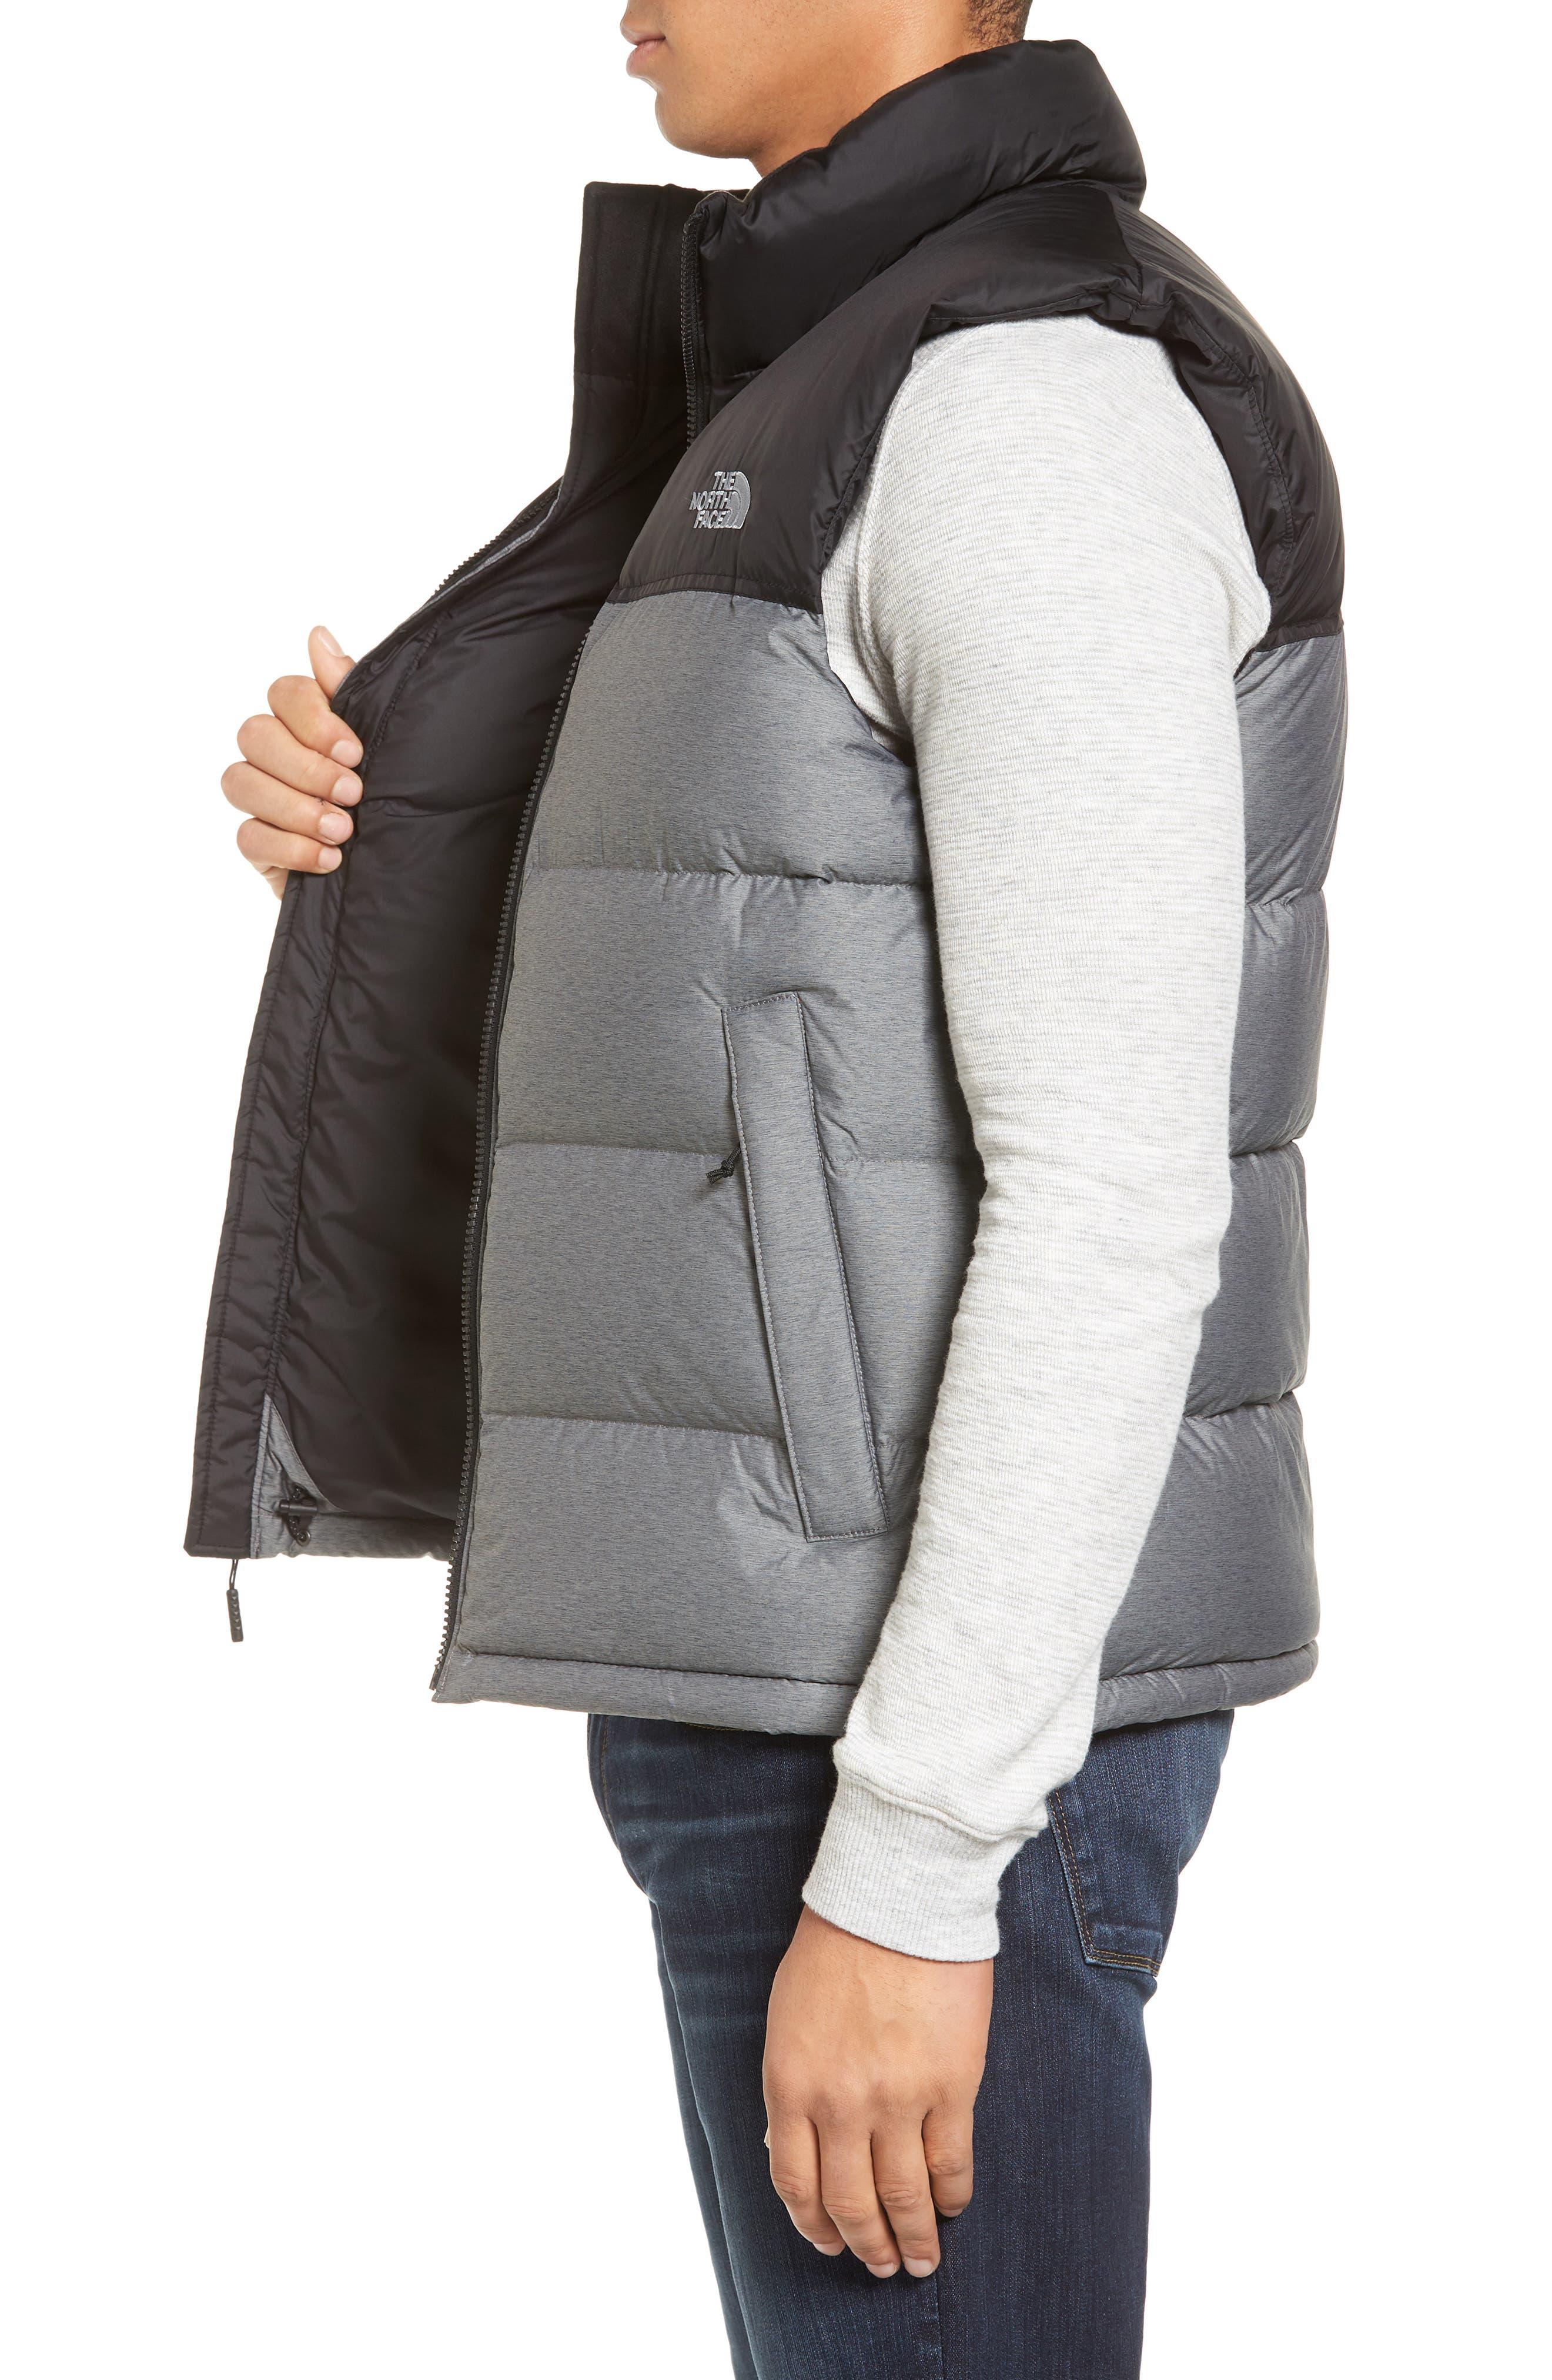 Nuptse Water Repellent Down Vest,                             Alternate thumbnail 3, color,                             Medium Grey Heather/ Black